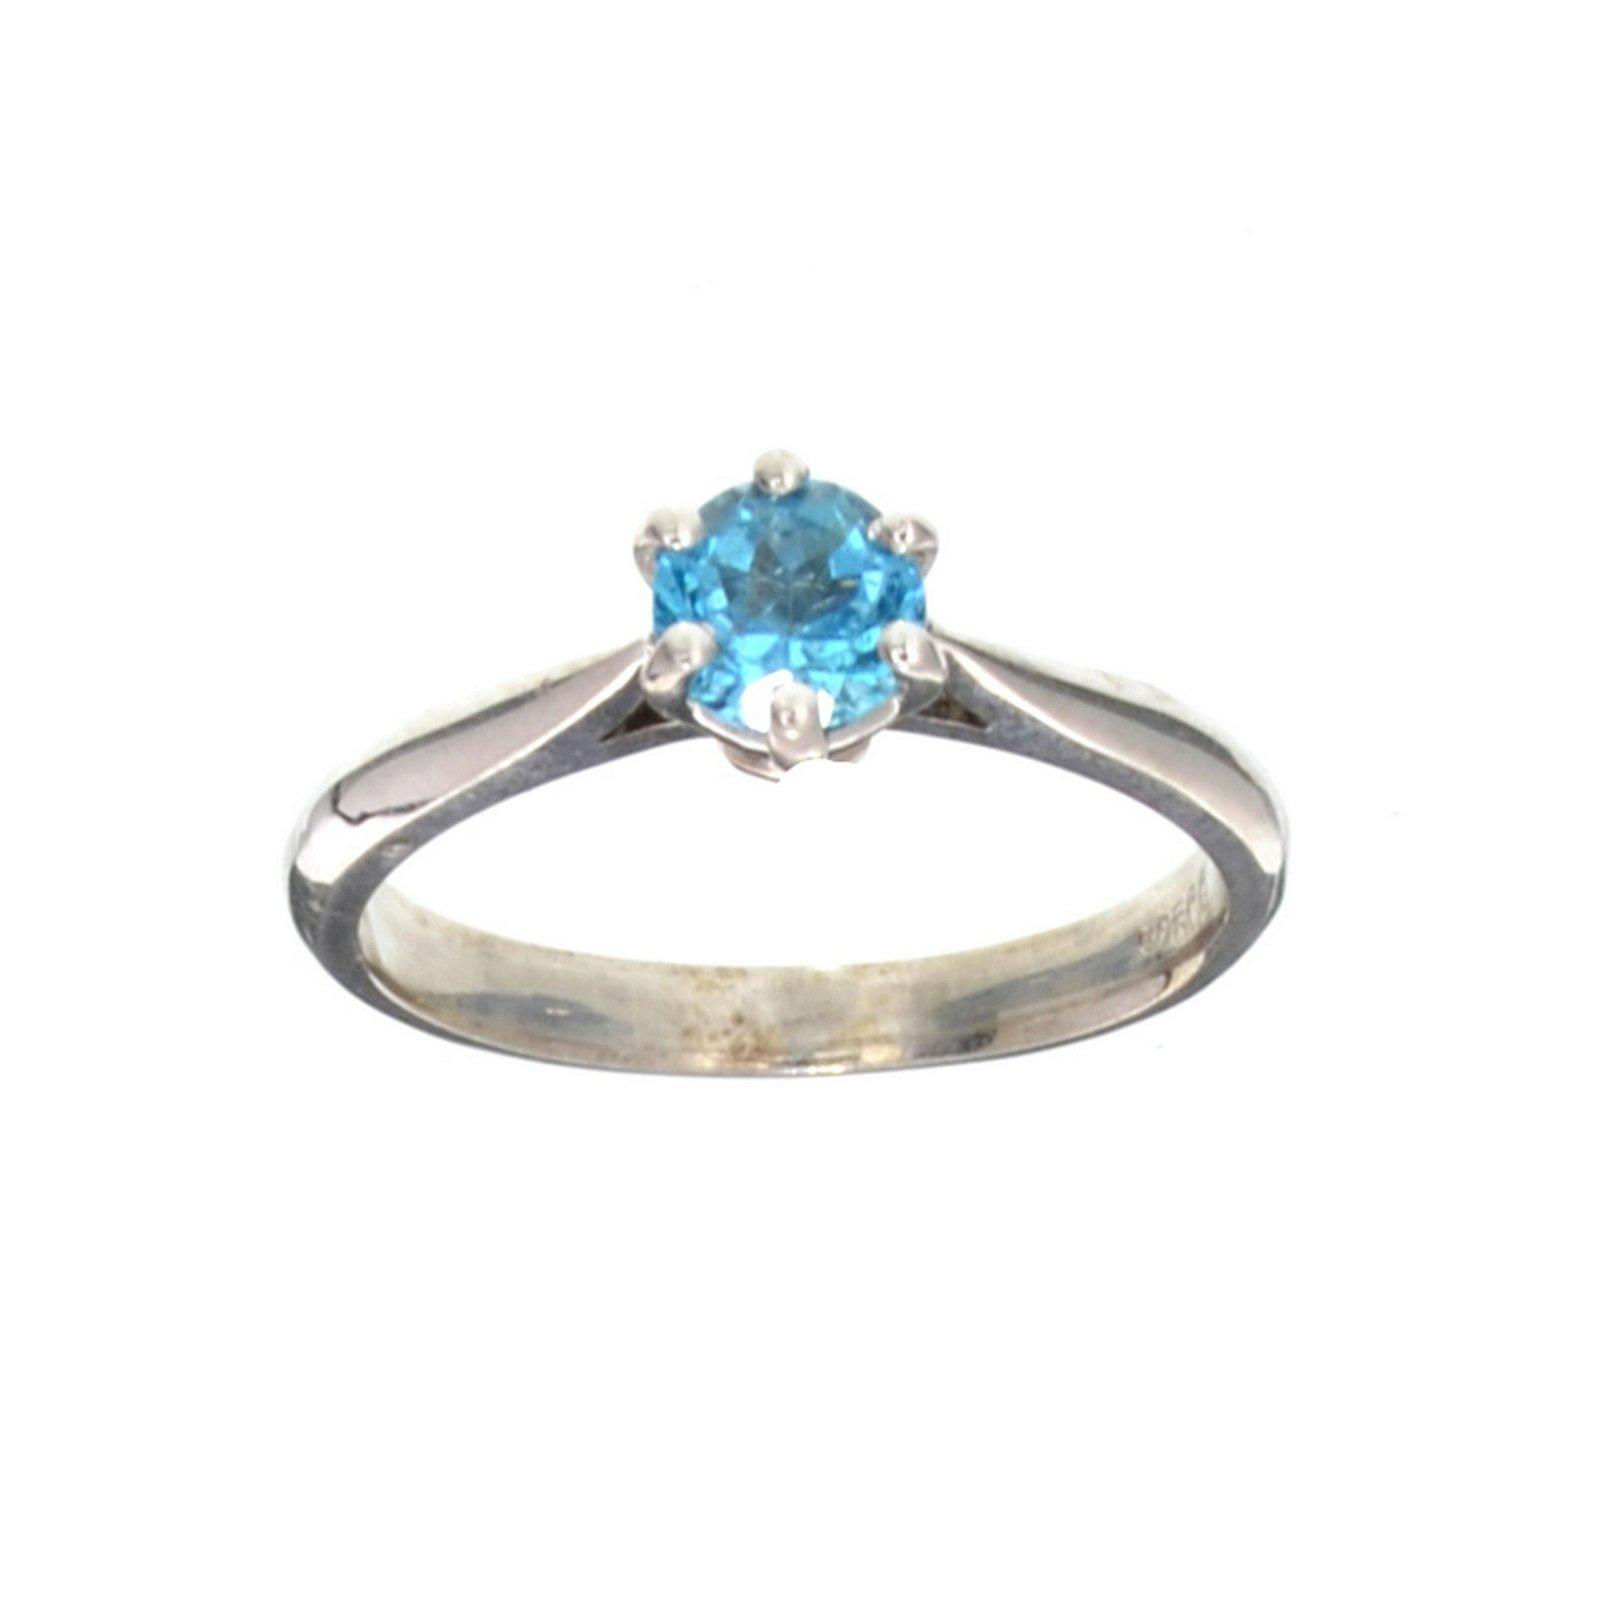 APP: 0.5k Fine Jewelry Designer Sebastian 0.68CT Round